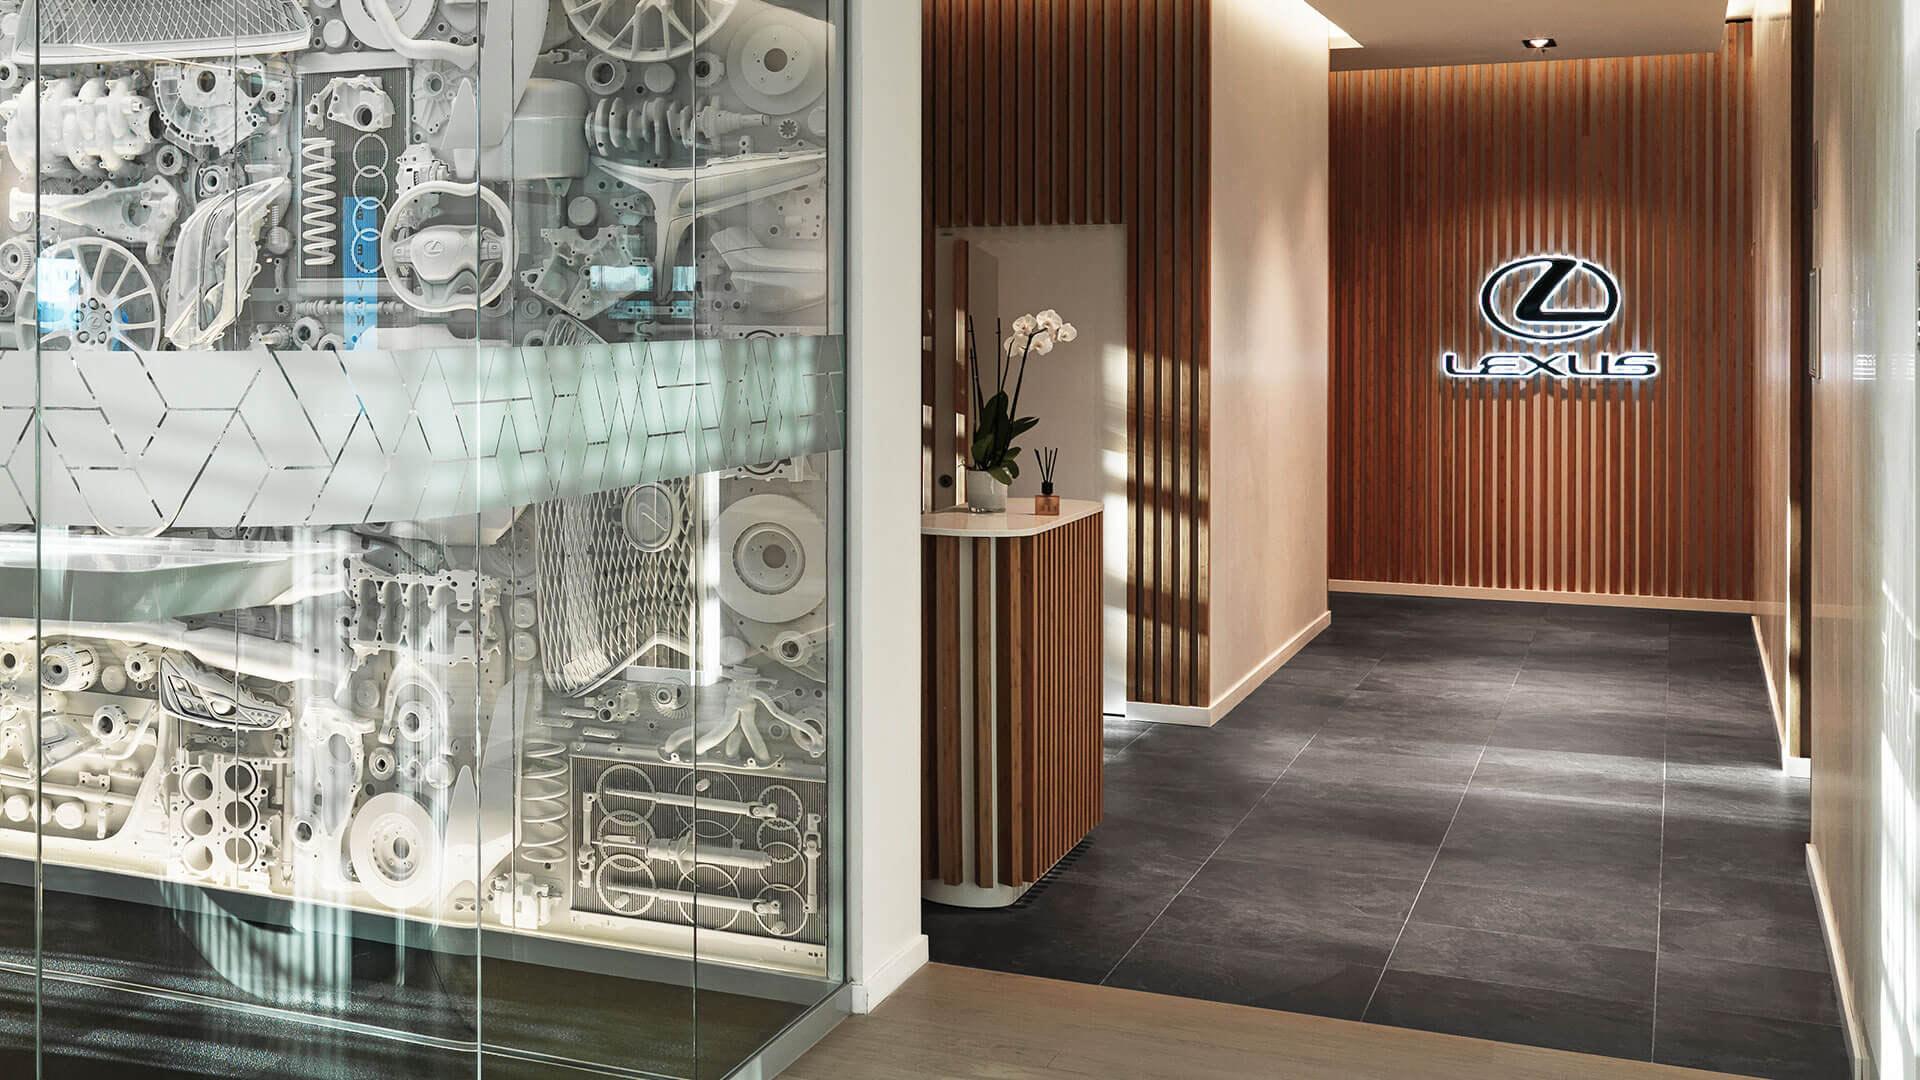 Spa im Loft by Lexus 2019